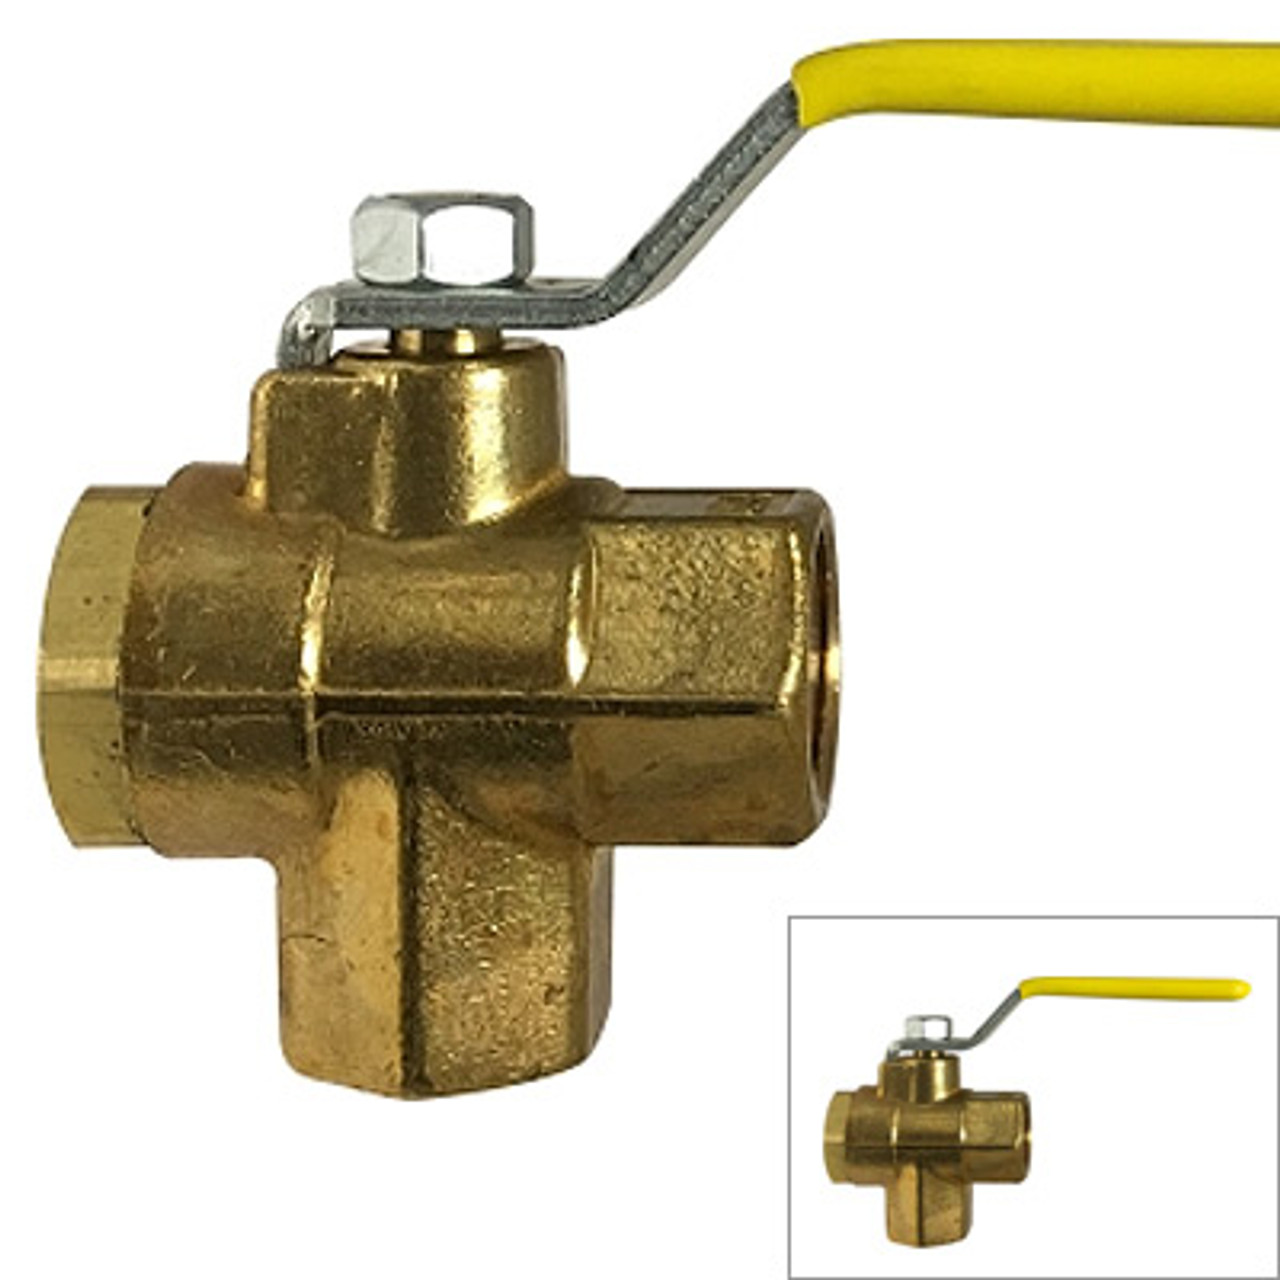 3 way outlet fuller 13 speed transmission diagram 1 4 ips ball valve fip forged brass bottom